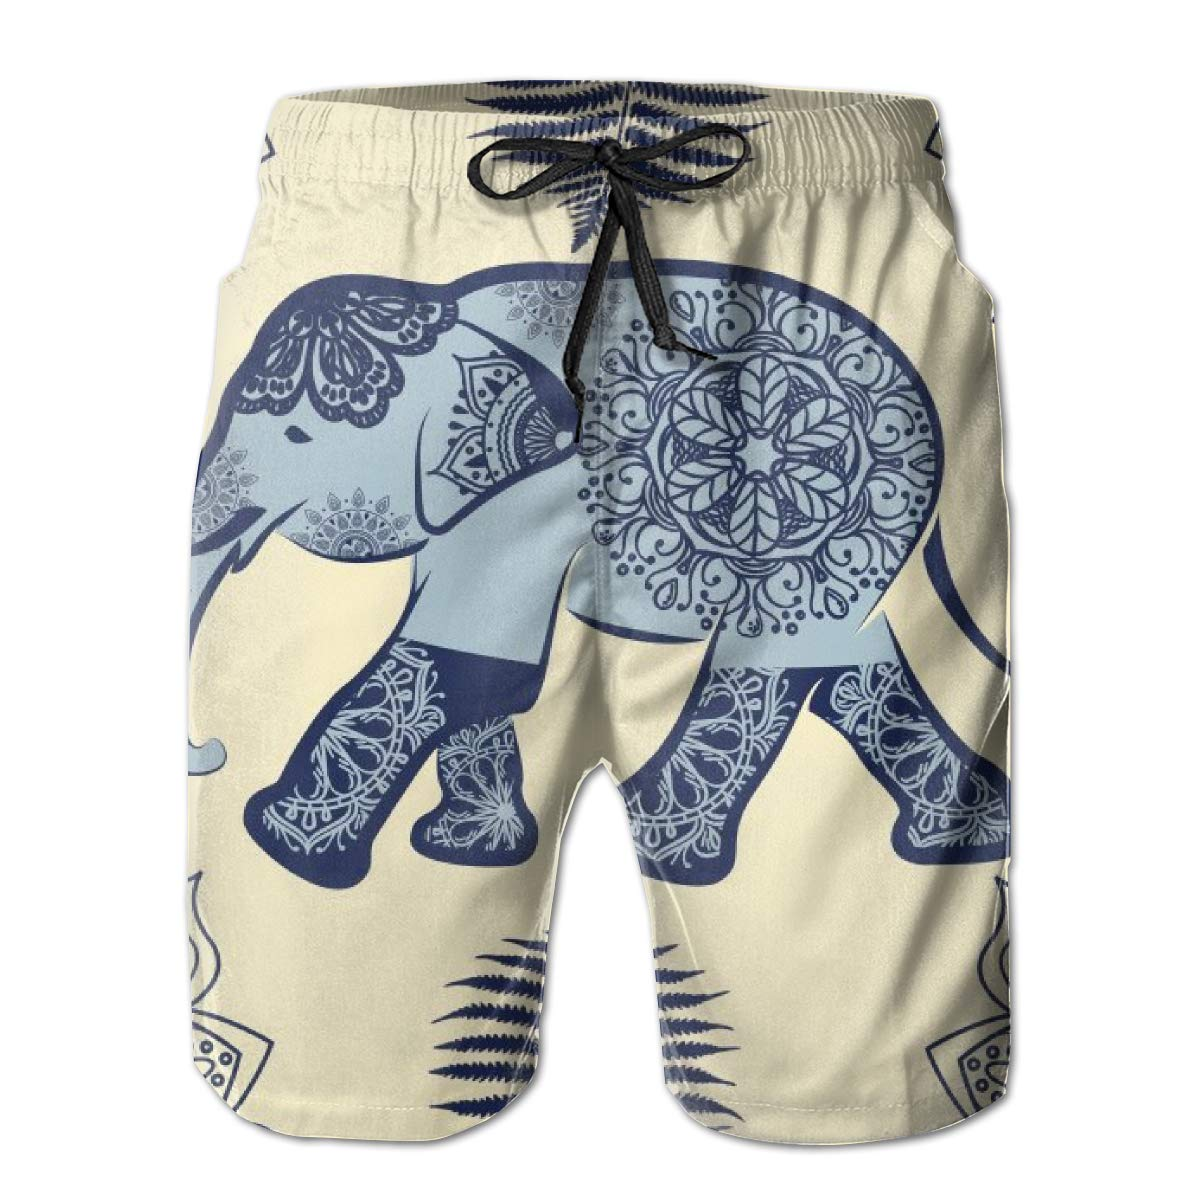 Galaxy Voyage Elephant Animal Boy Mens Swim Trunks Surf Pants 3D Swimming Trunks Board Shorts for Men